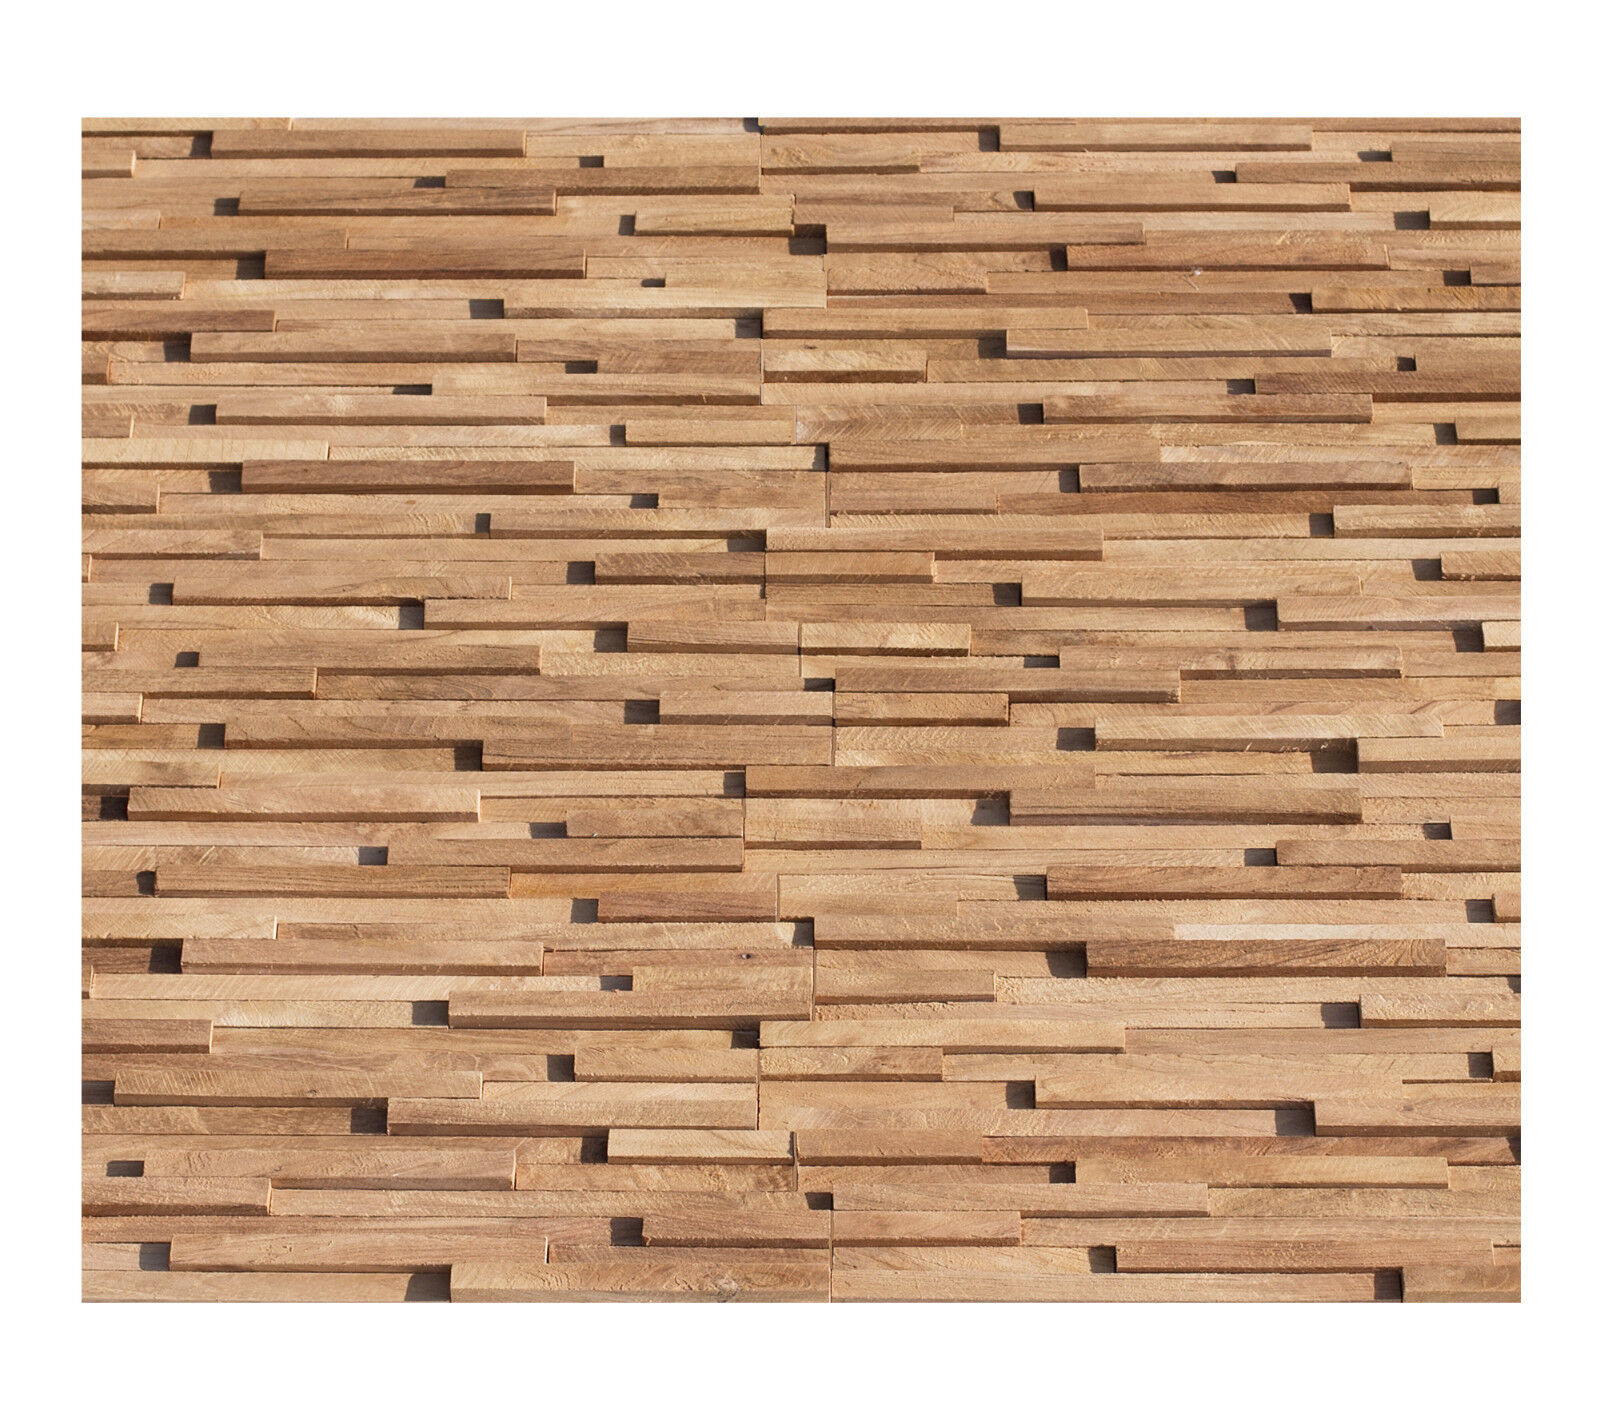 1 qm Teak Holz Mosaikfliesen HO-007 Wandverkleidung Holzwand Wanddekoration